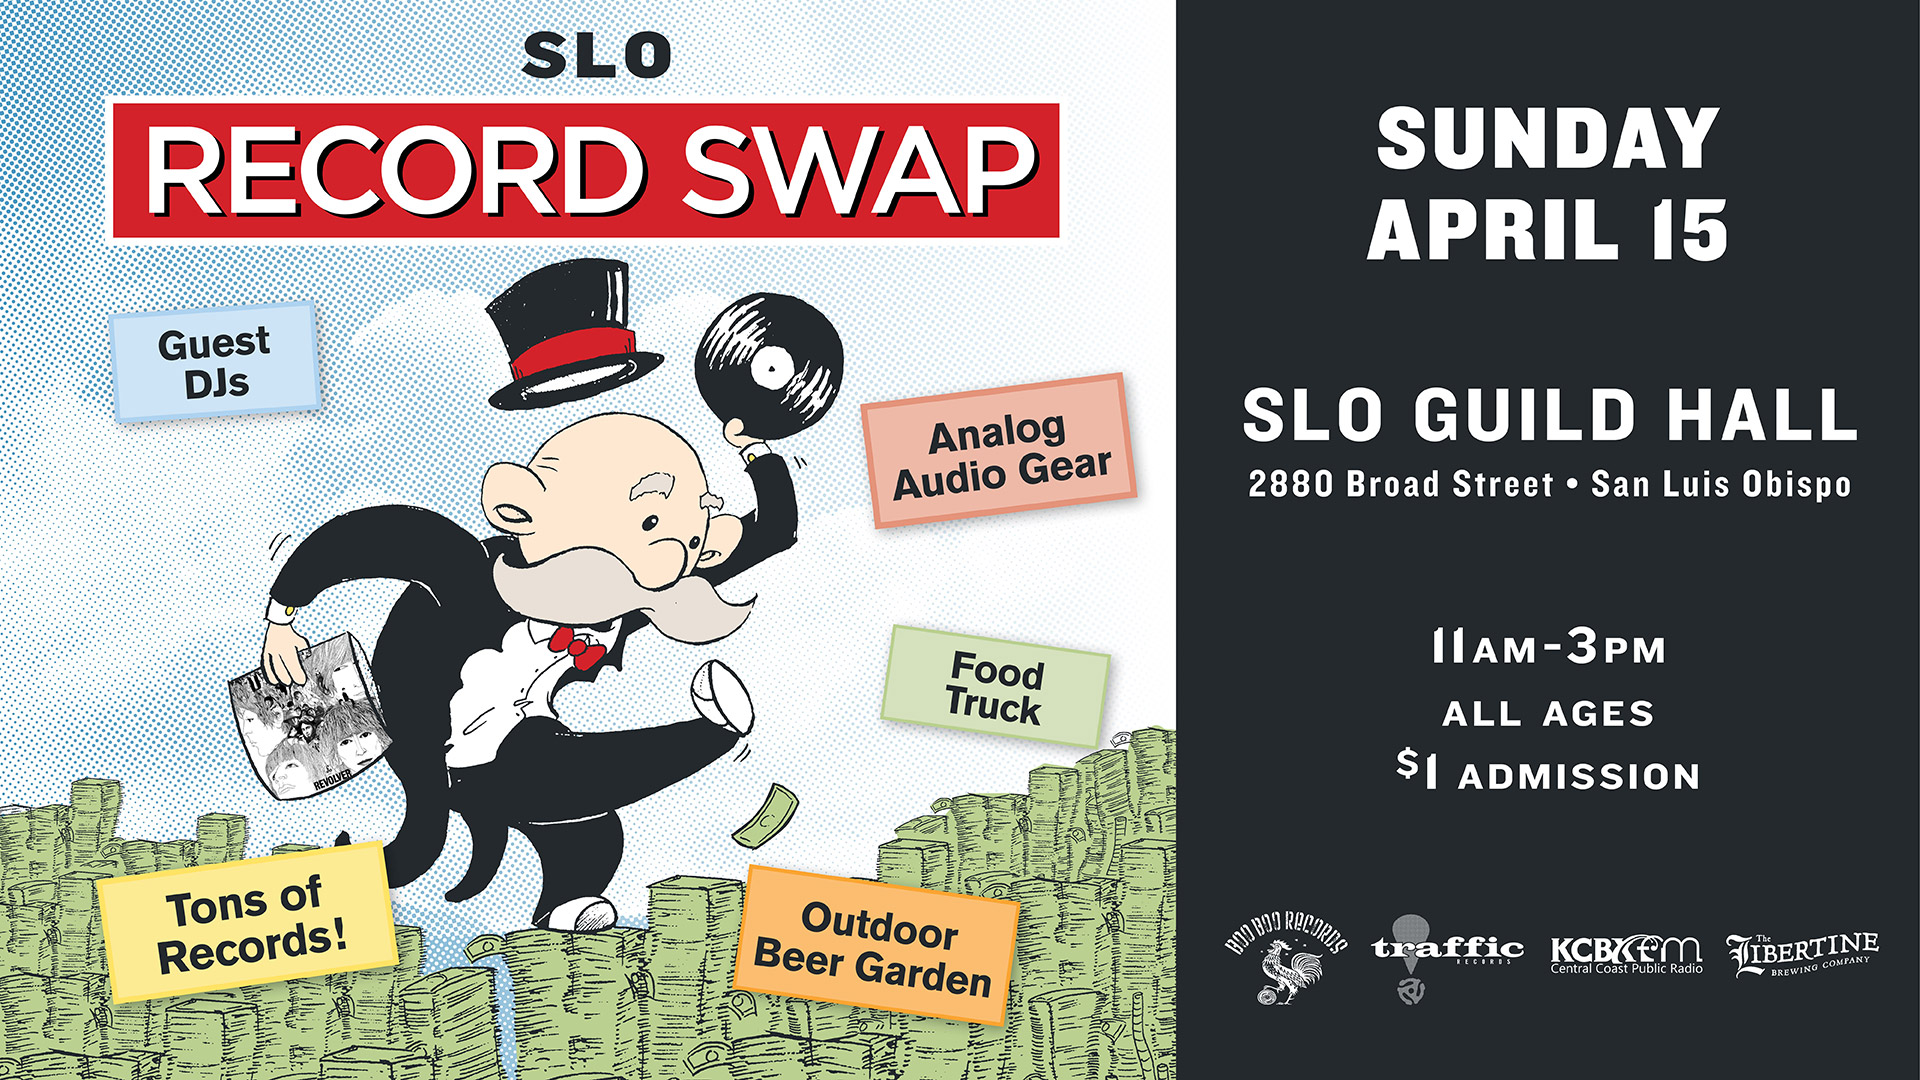 SLO Record swap Sunday 4/15/2018 SLO Guild Hall (Formerly Grange Hall) 2880 Broad St. San Luis Obispo Ca.